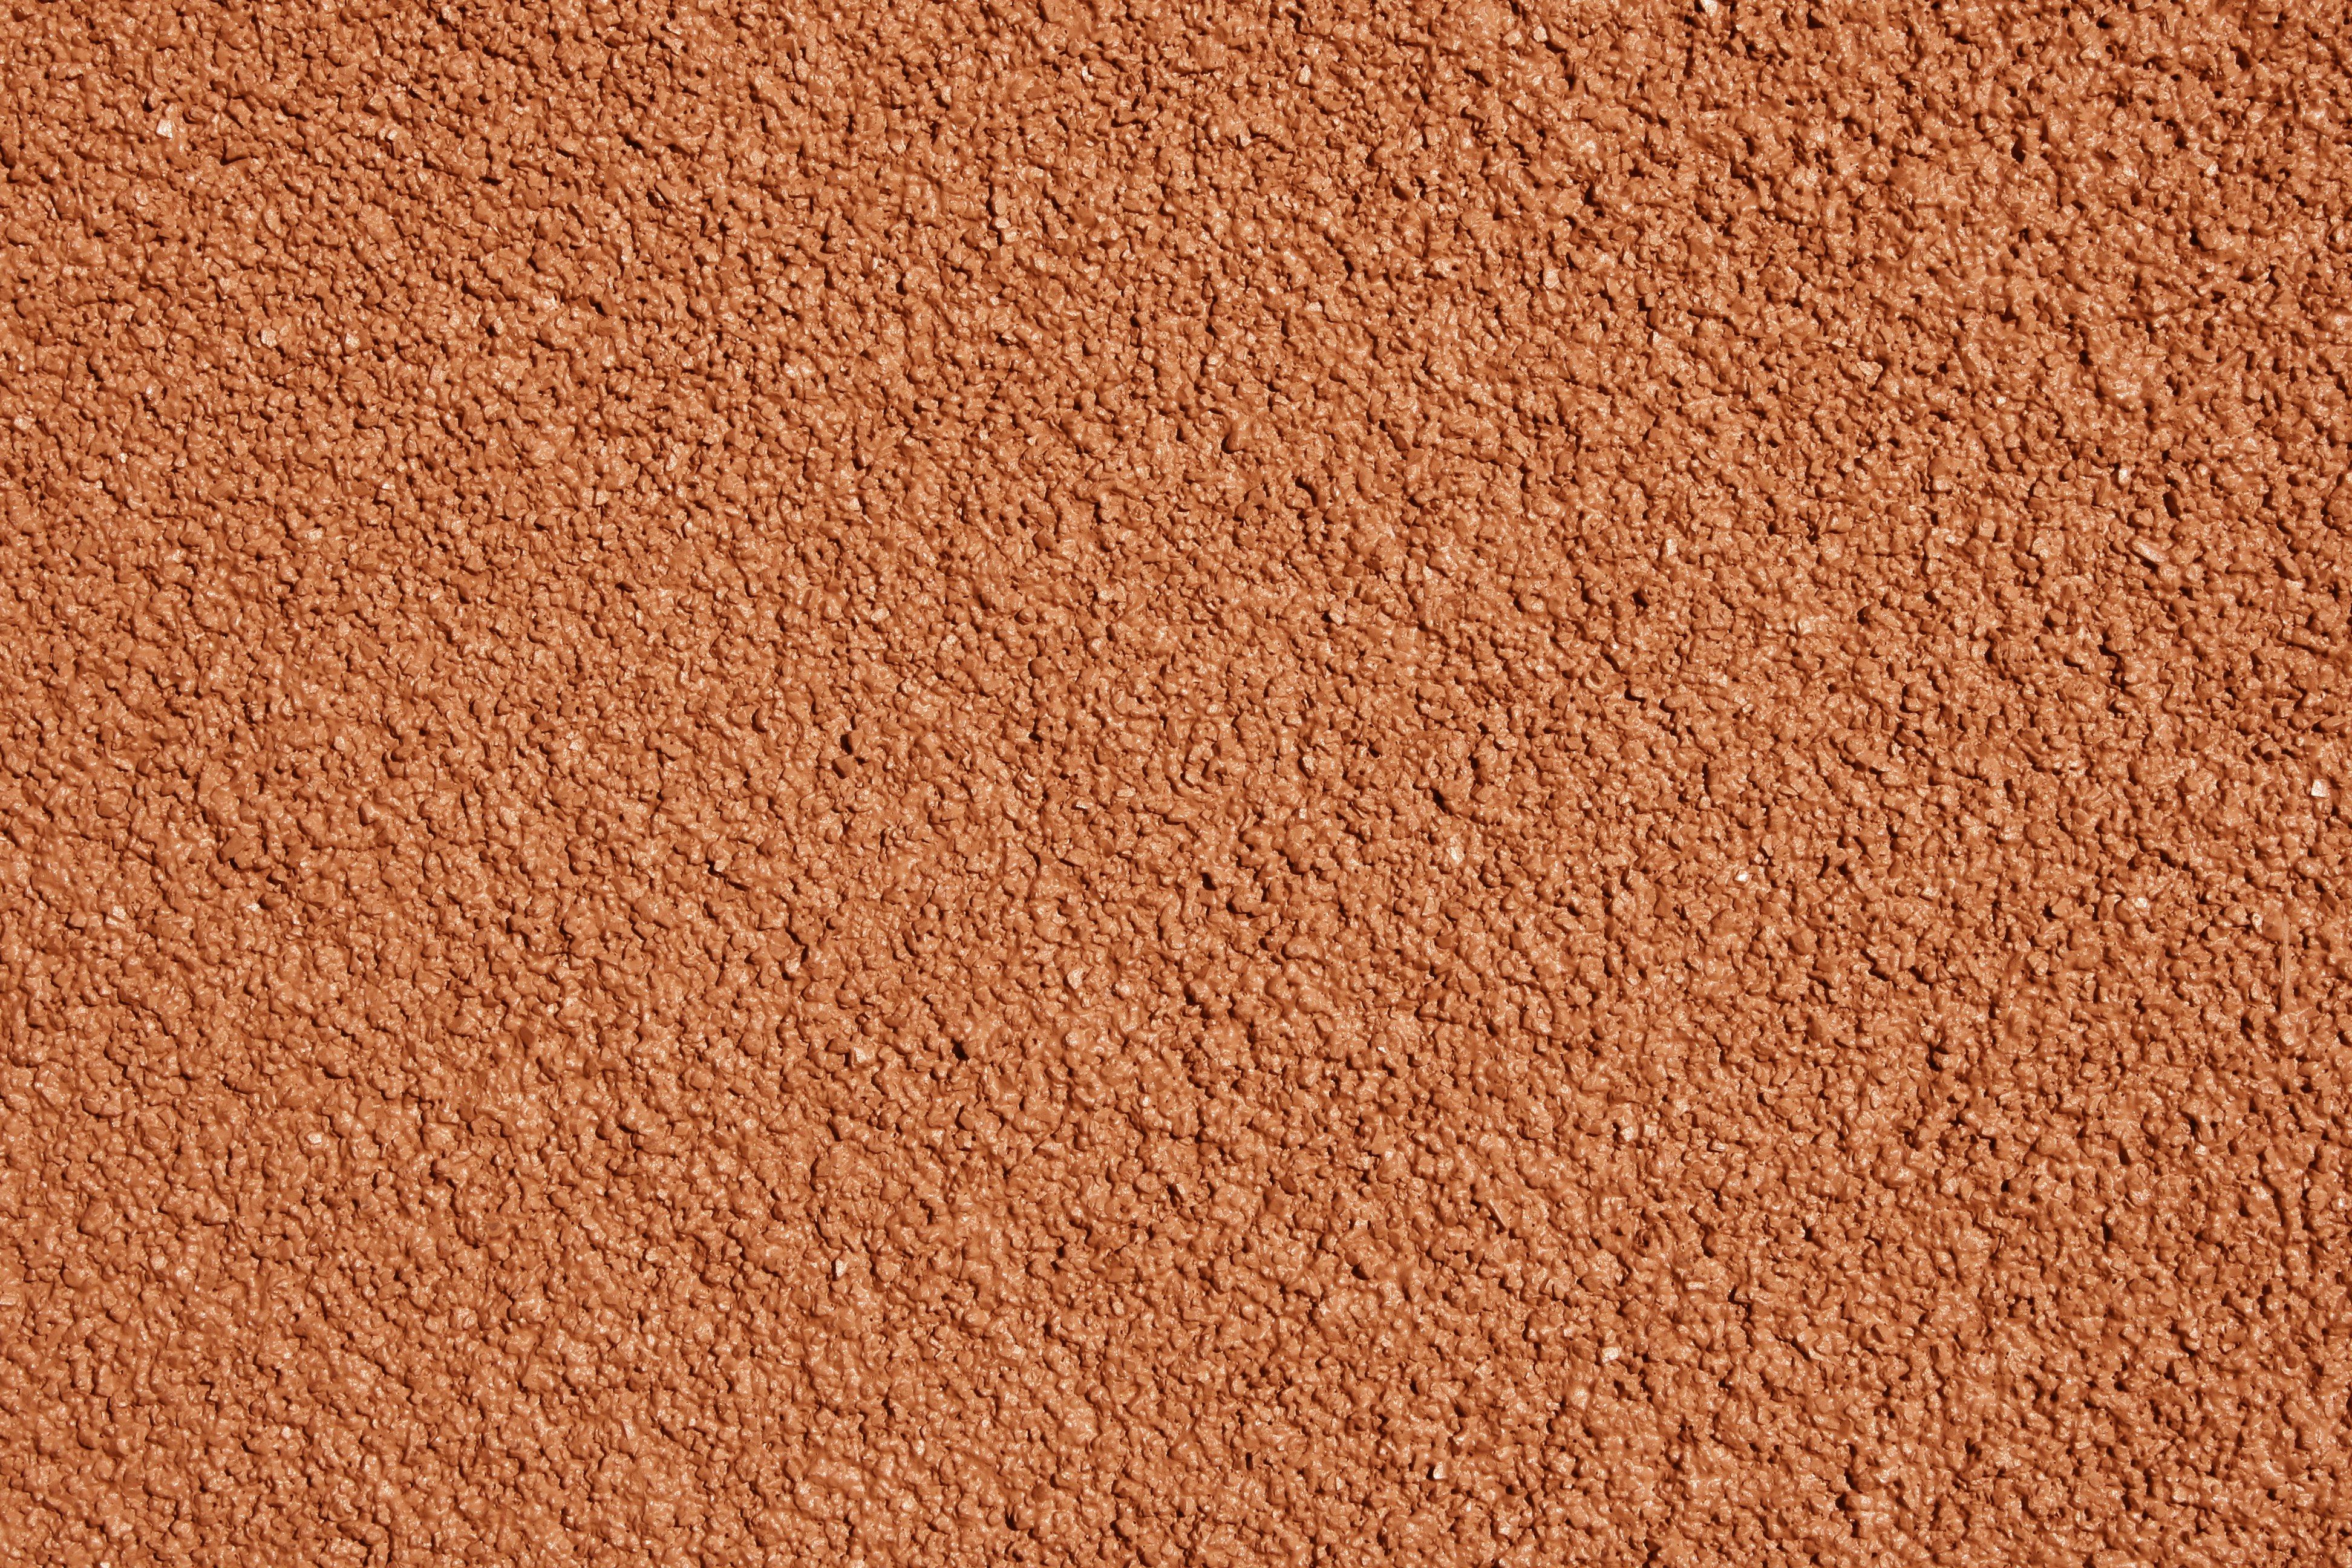 Red Stucco Close Up Texture Picture Photograph Photos Public 3888x2592